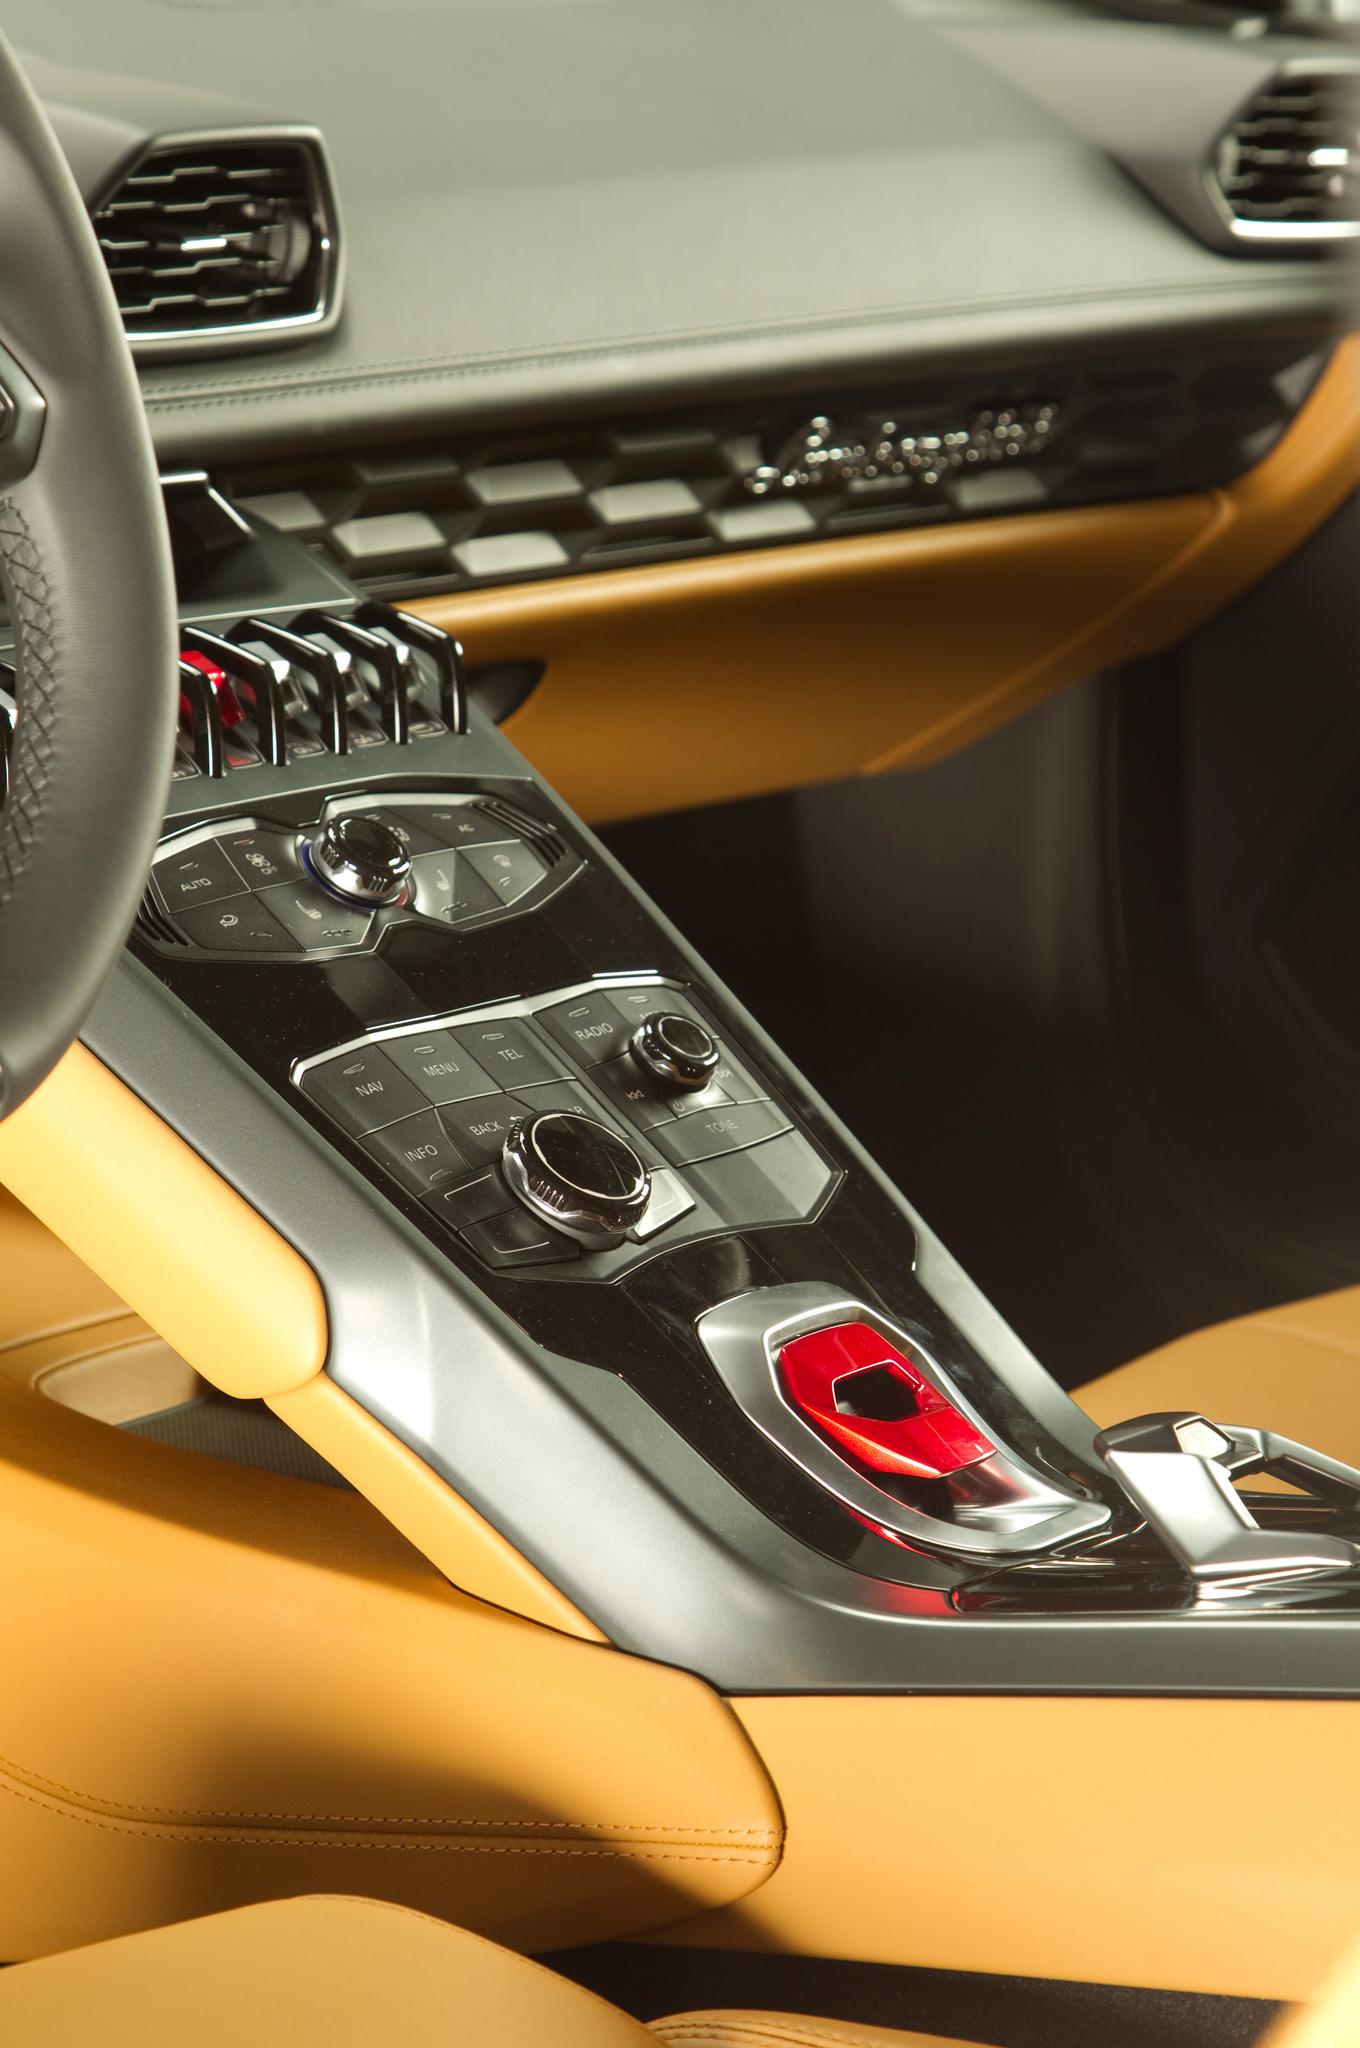 http—image.motortrend.com-f-roadtests-exotic-1312_2015_lamborghini_huracan_first_look-59411591-2015-Lamborghini-Huracan-center-console-03